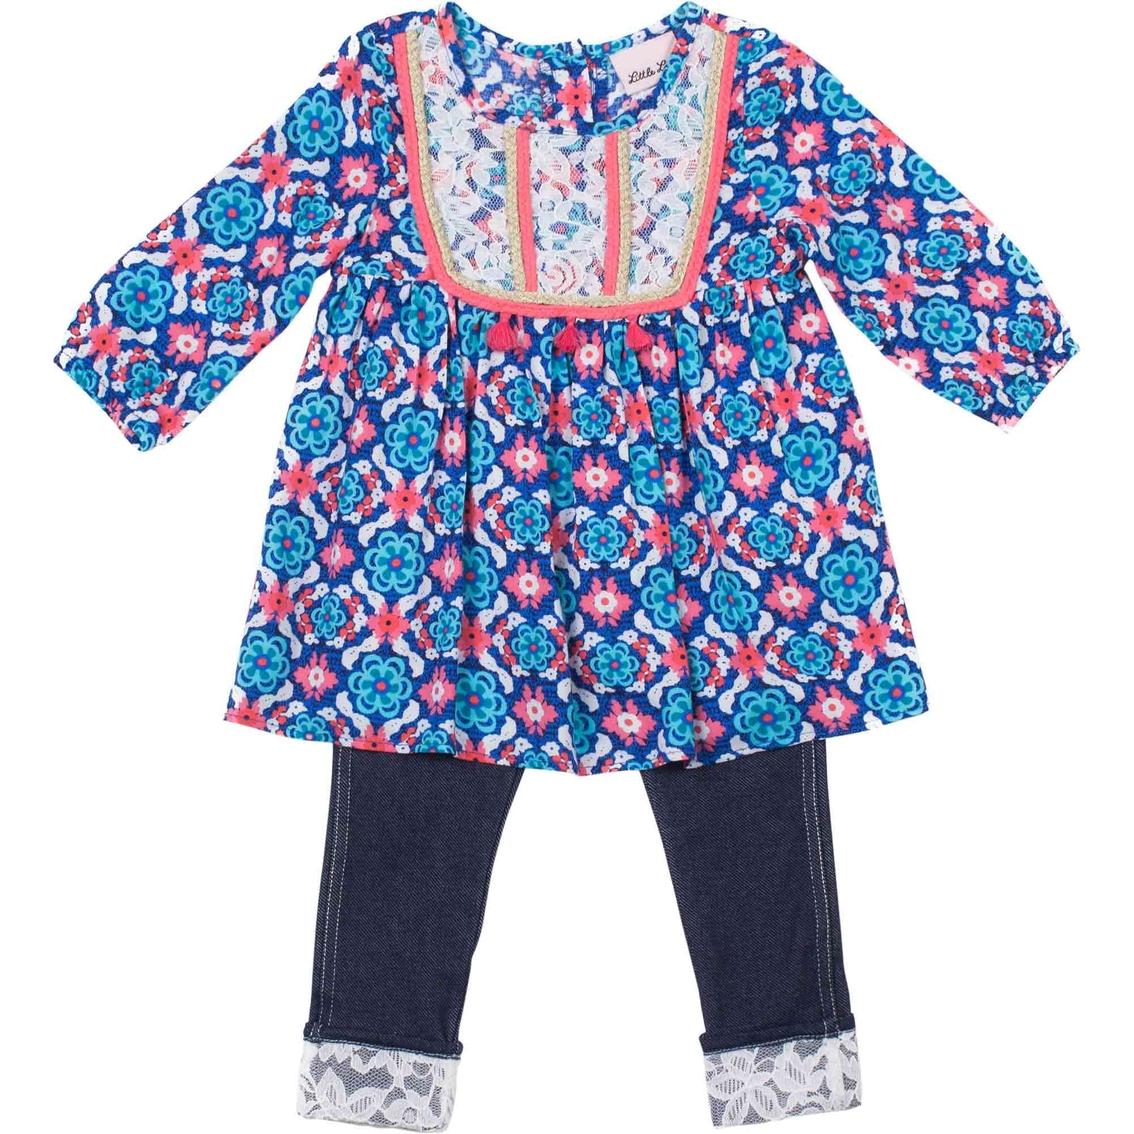 e56ccde05abe2 Little Lass Infant Girls 2 Pc. Lace Trim Leggings Set   Baby Girl 0 ...